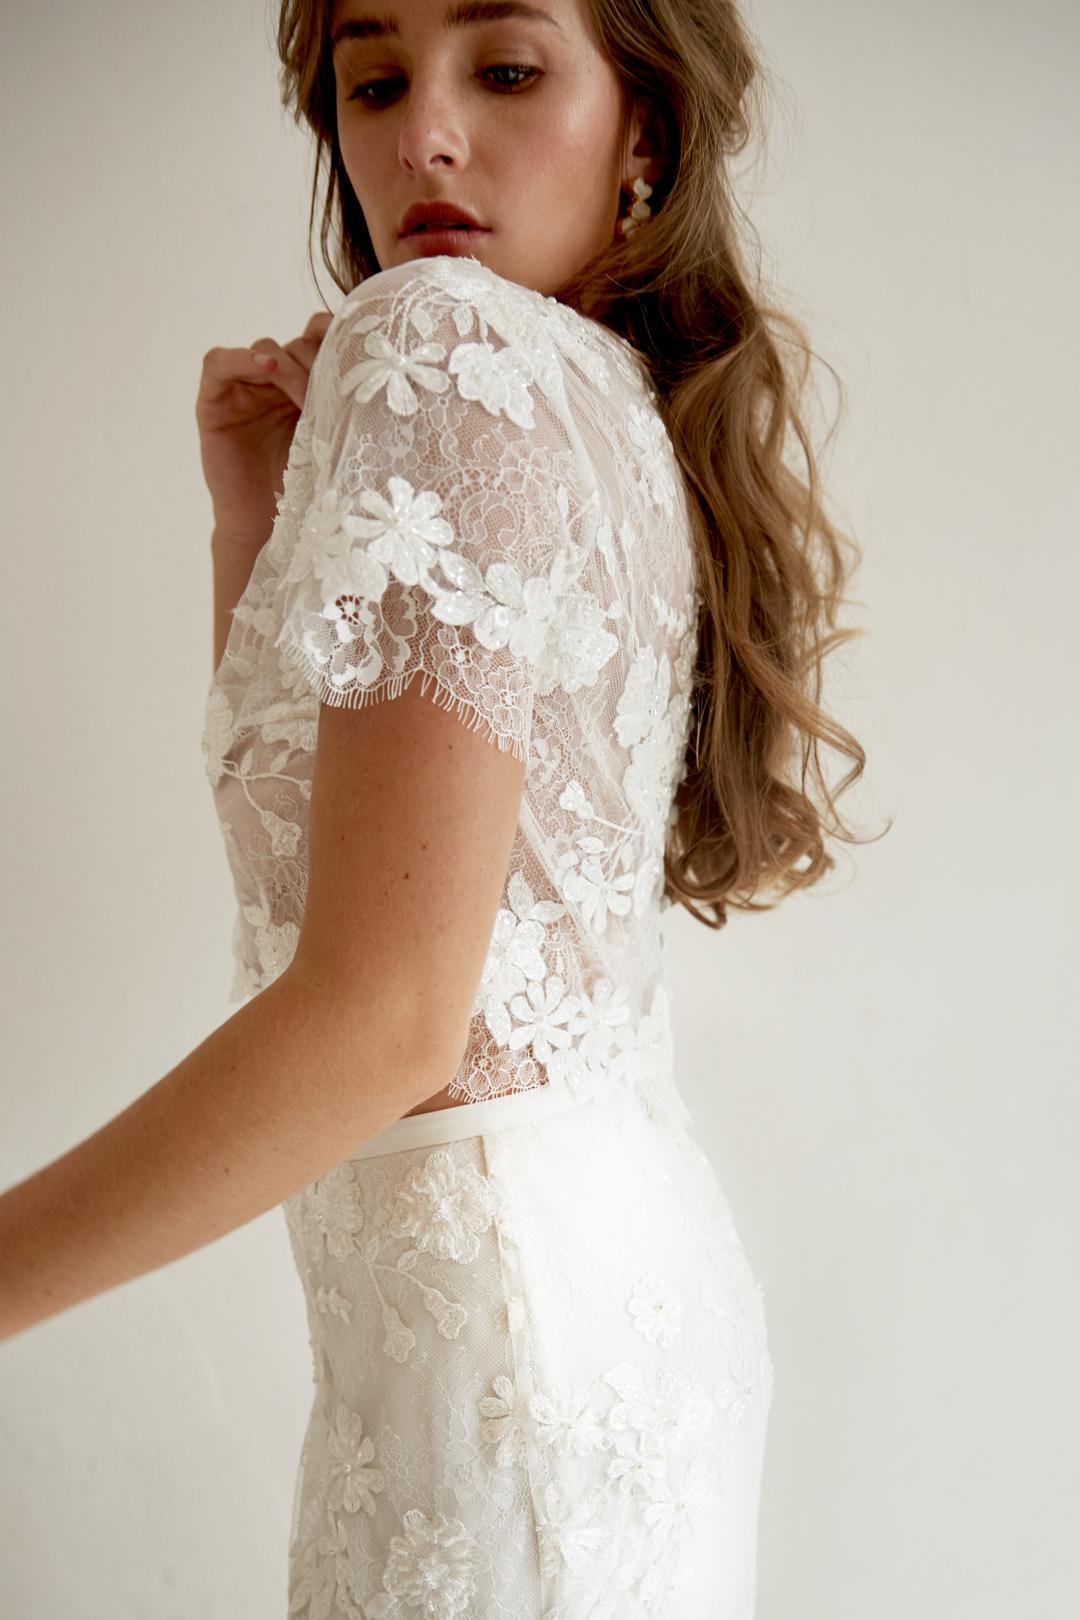 cove top dress photo